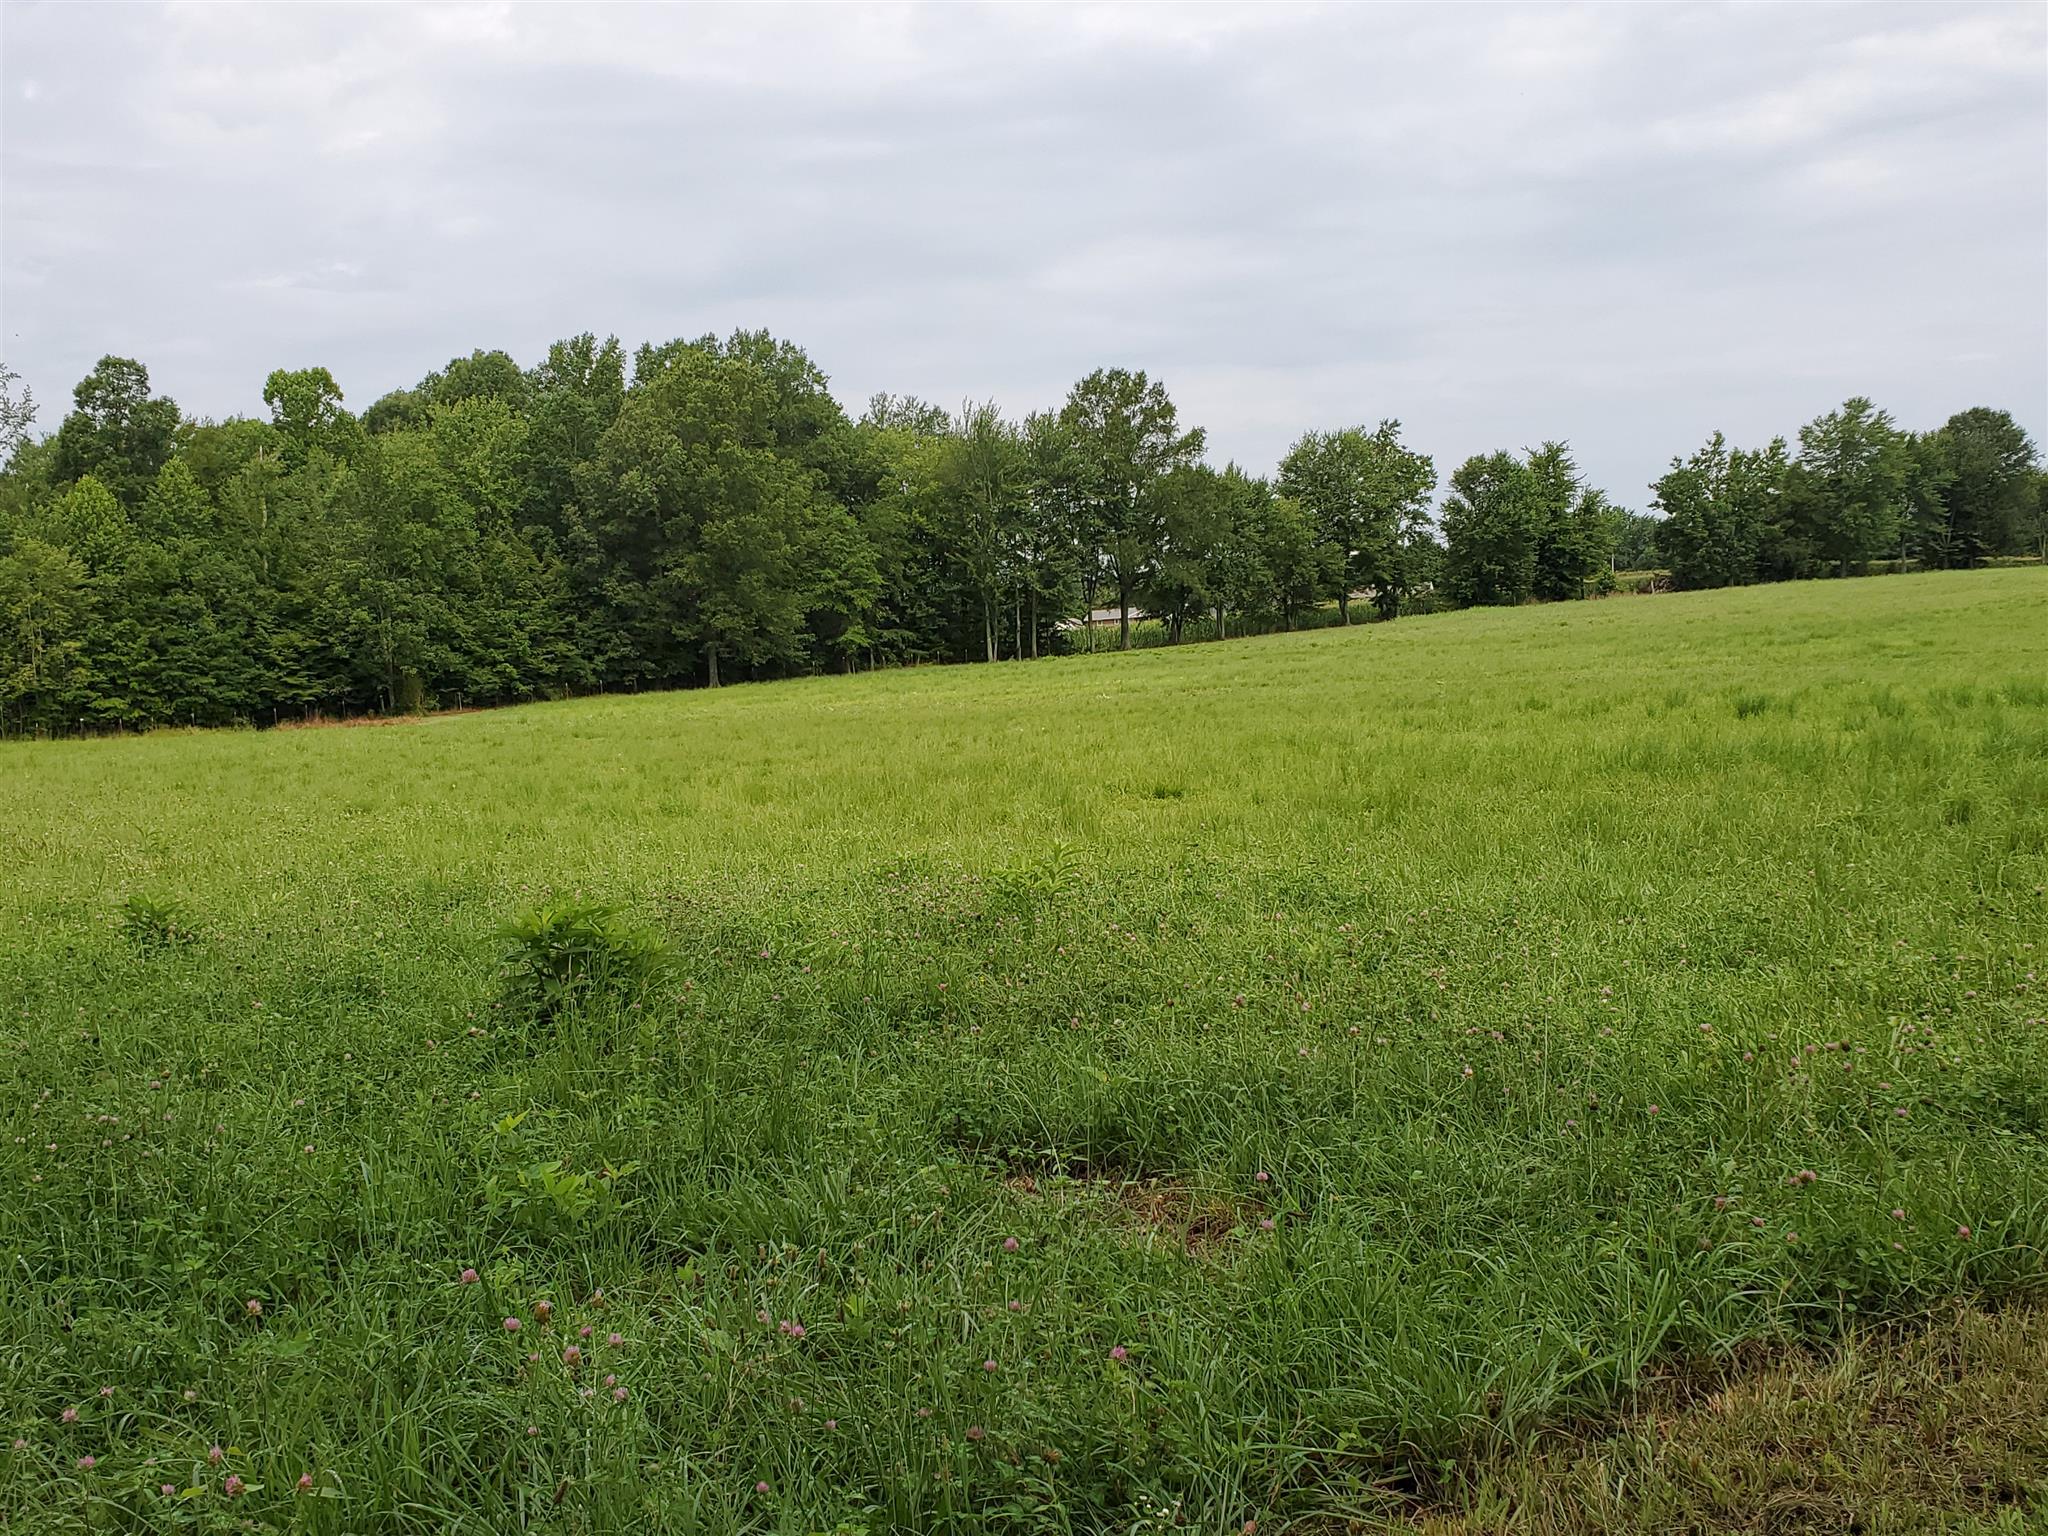 839 Dry Creek Rd, Smithville, TN 37166 - Smithville, TN real estate listing